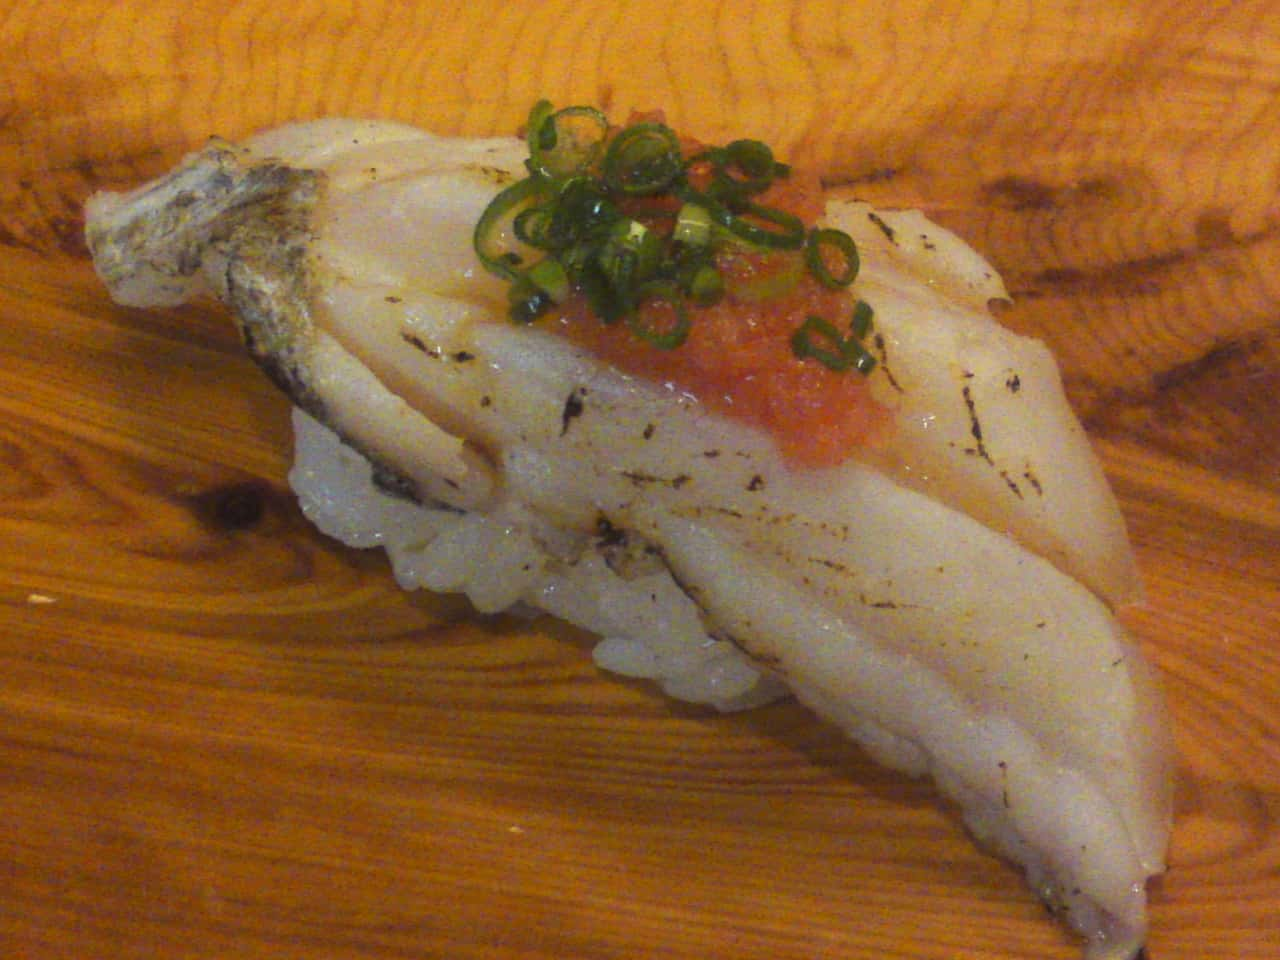 """Tachiuo/Scabbard or Cutlass Fish"" nigiri in ""Aburi/seared"" style topped with ""momiji oroshi/grated daikon seasoned with chili powder and chopped scallion"